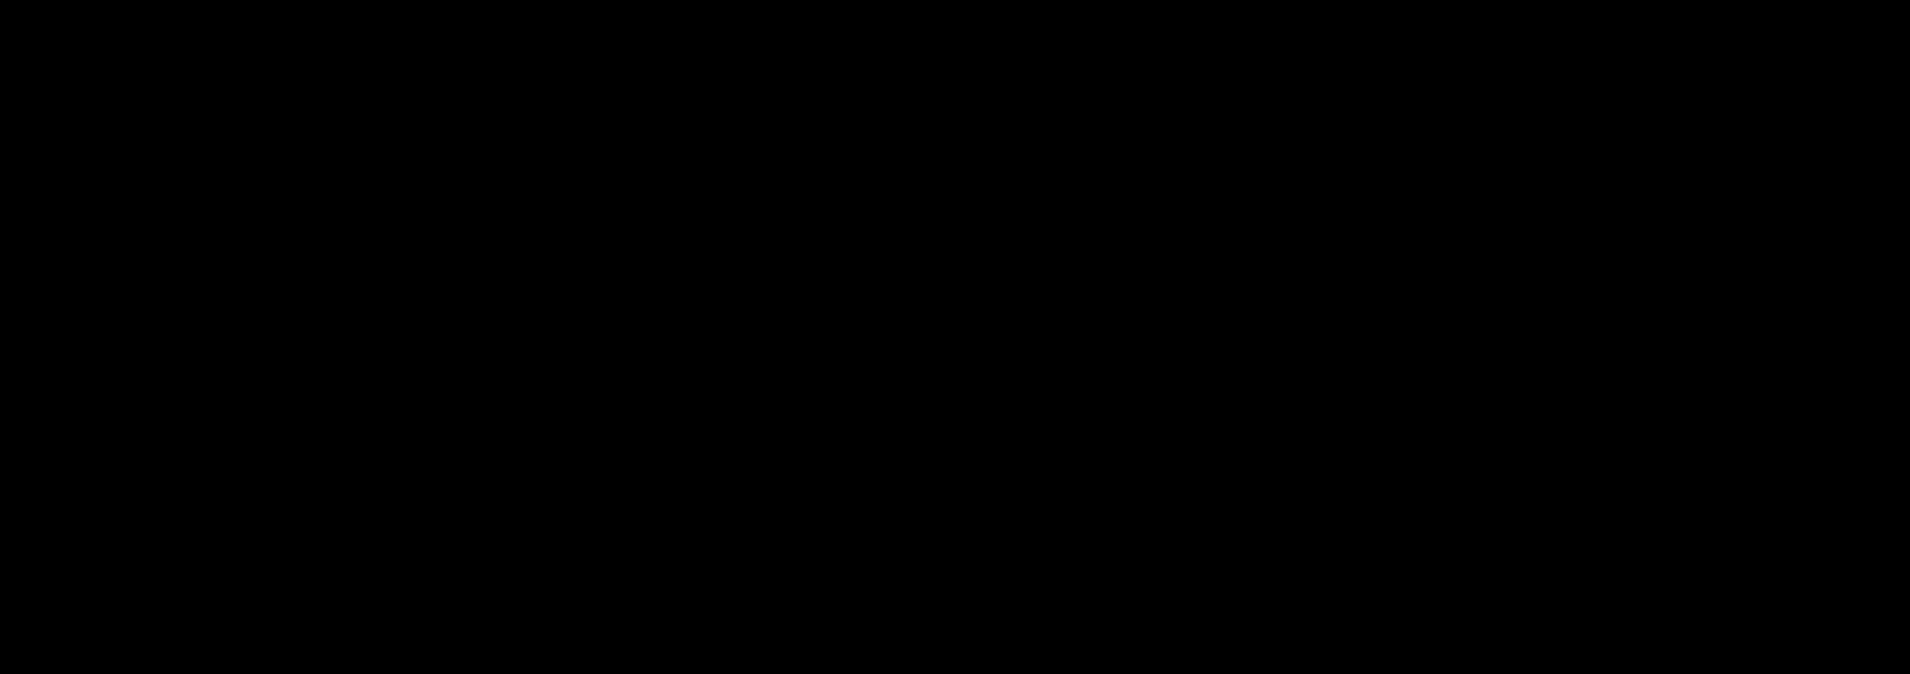 Polymer PF-PD